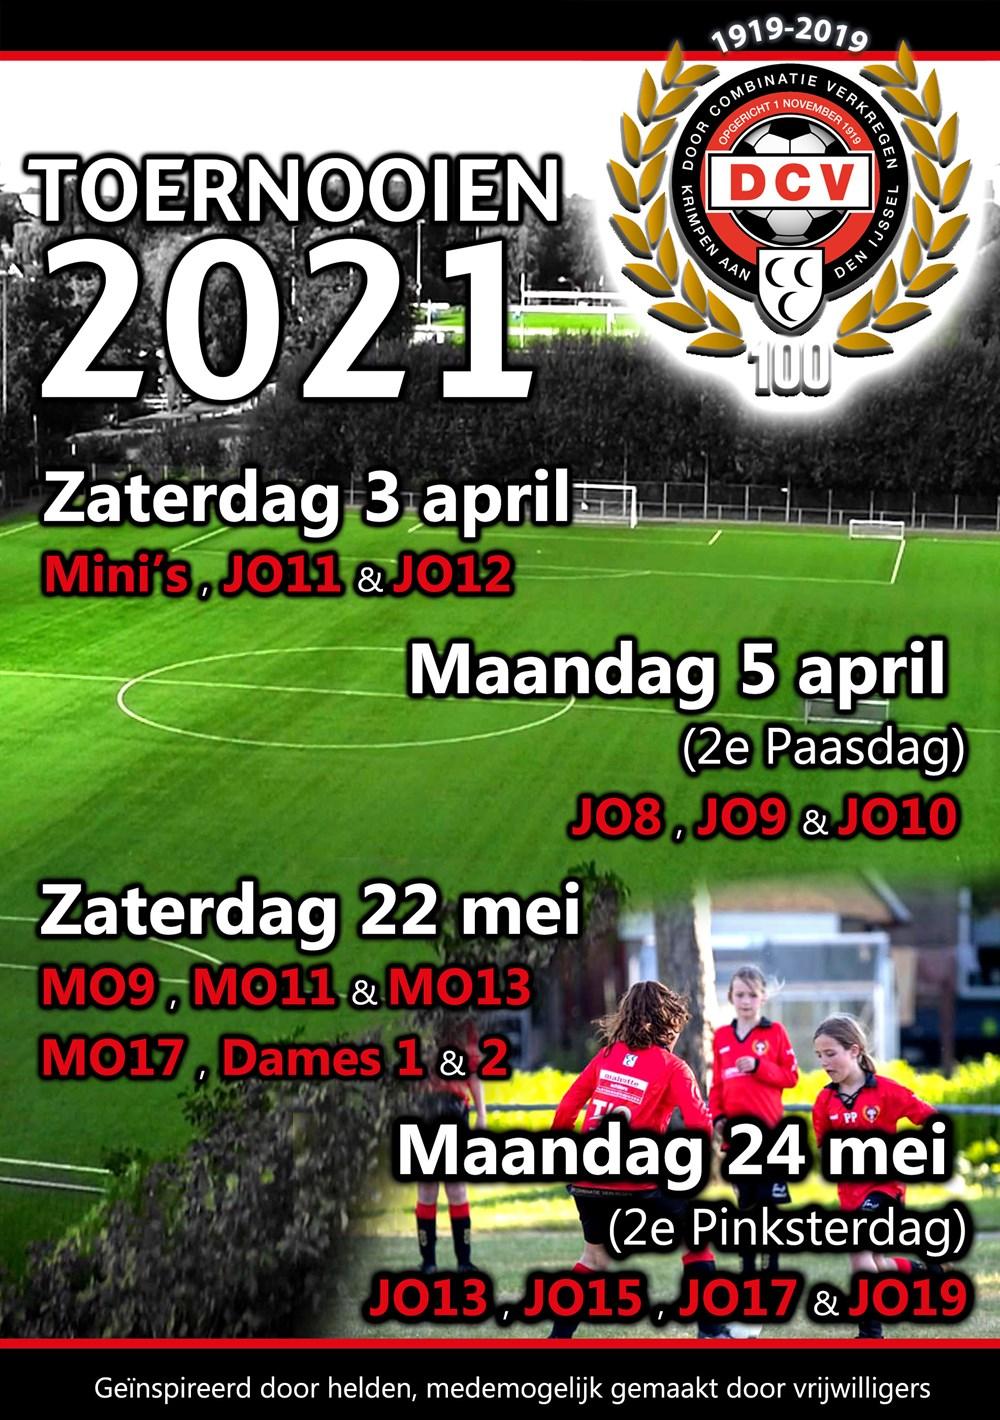 Flyer_toernooi_2021.jpg